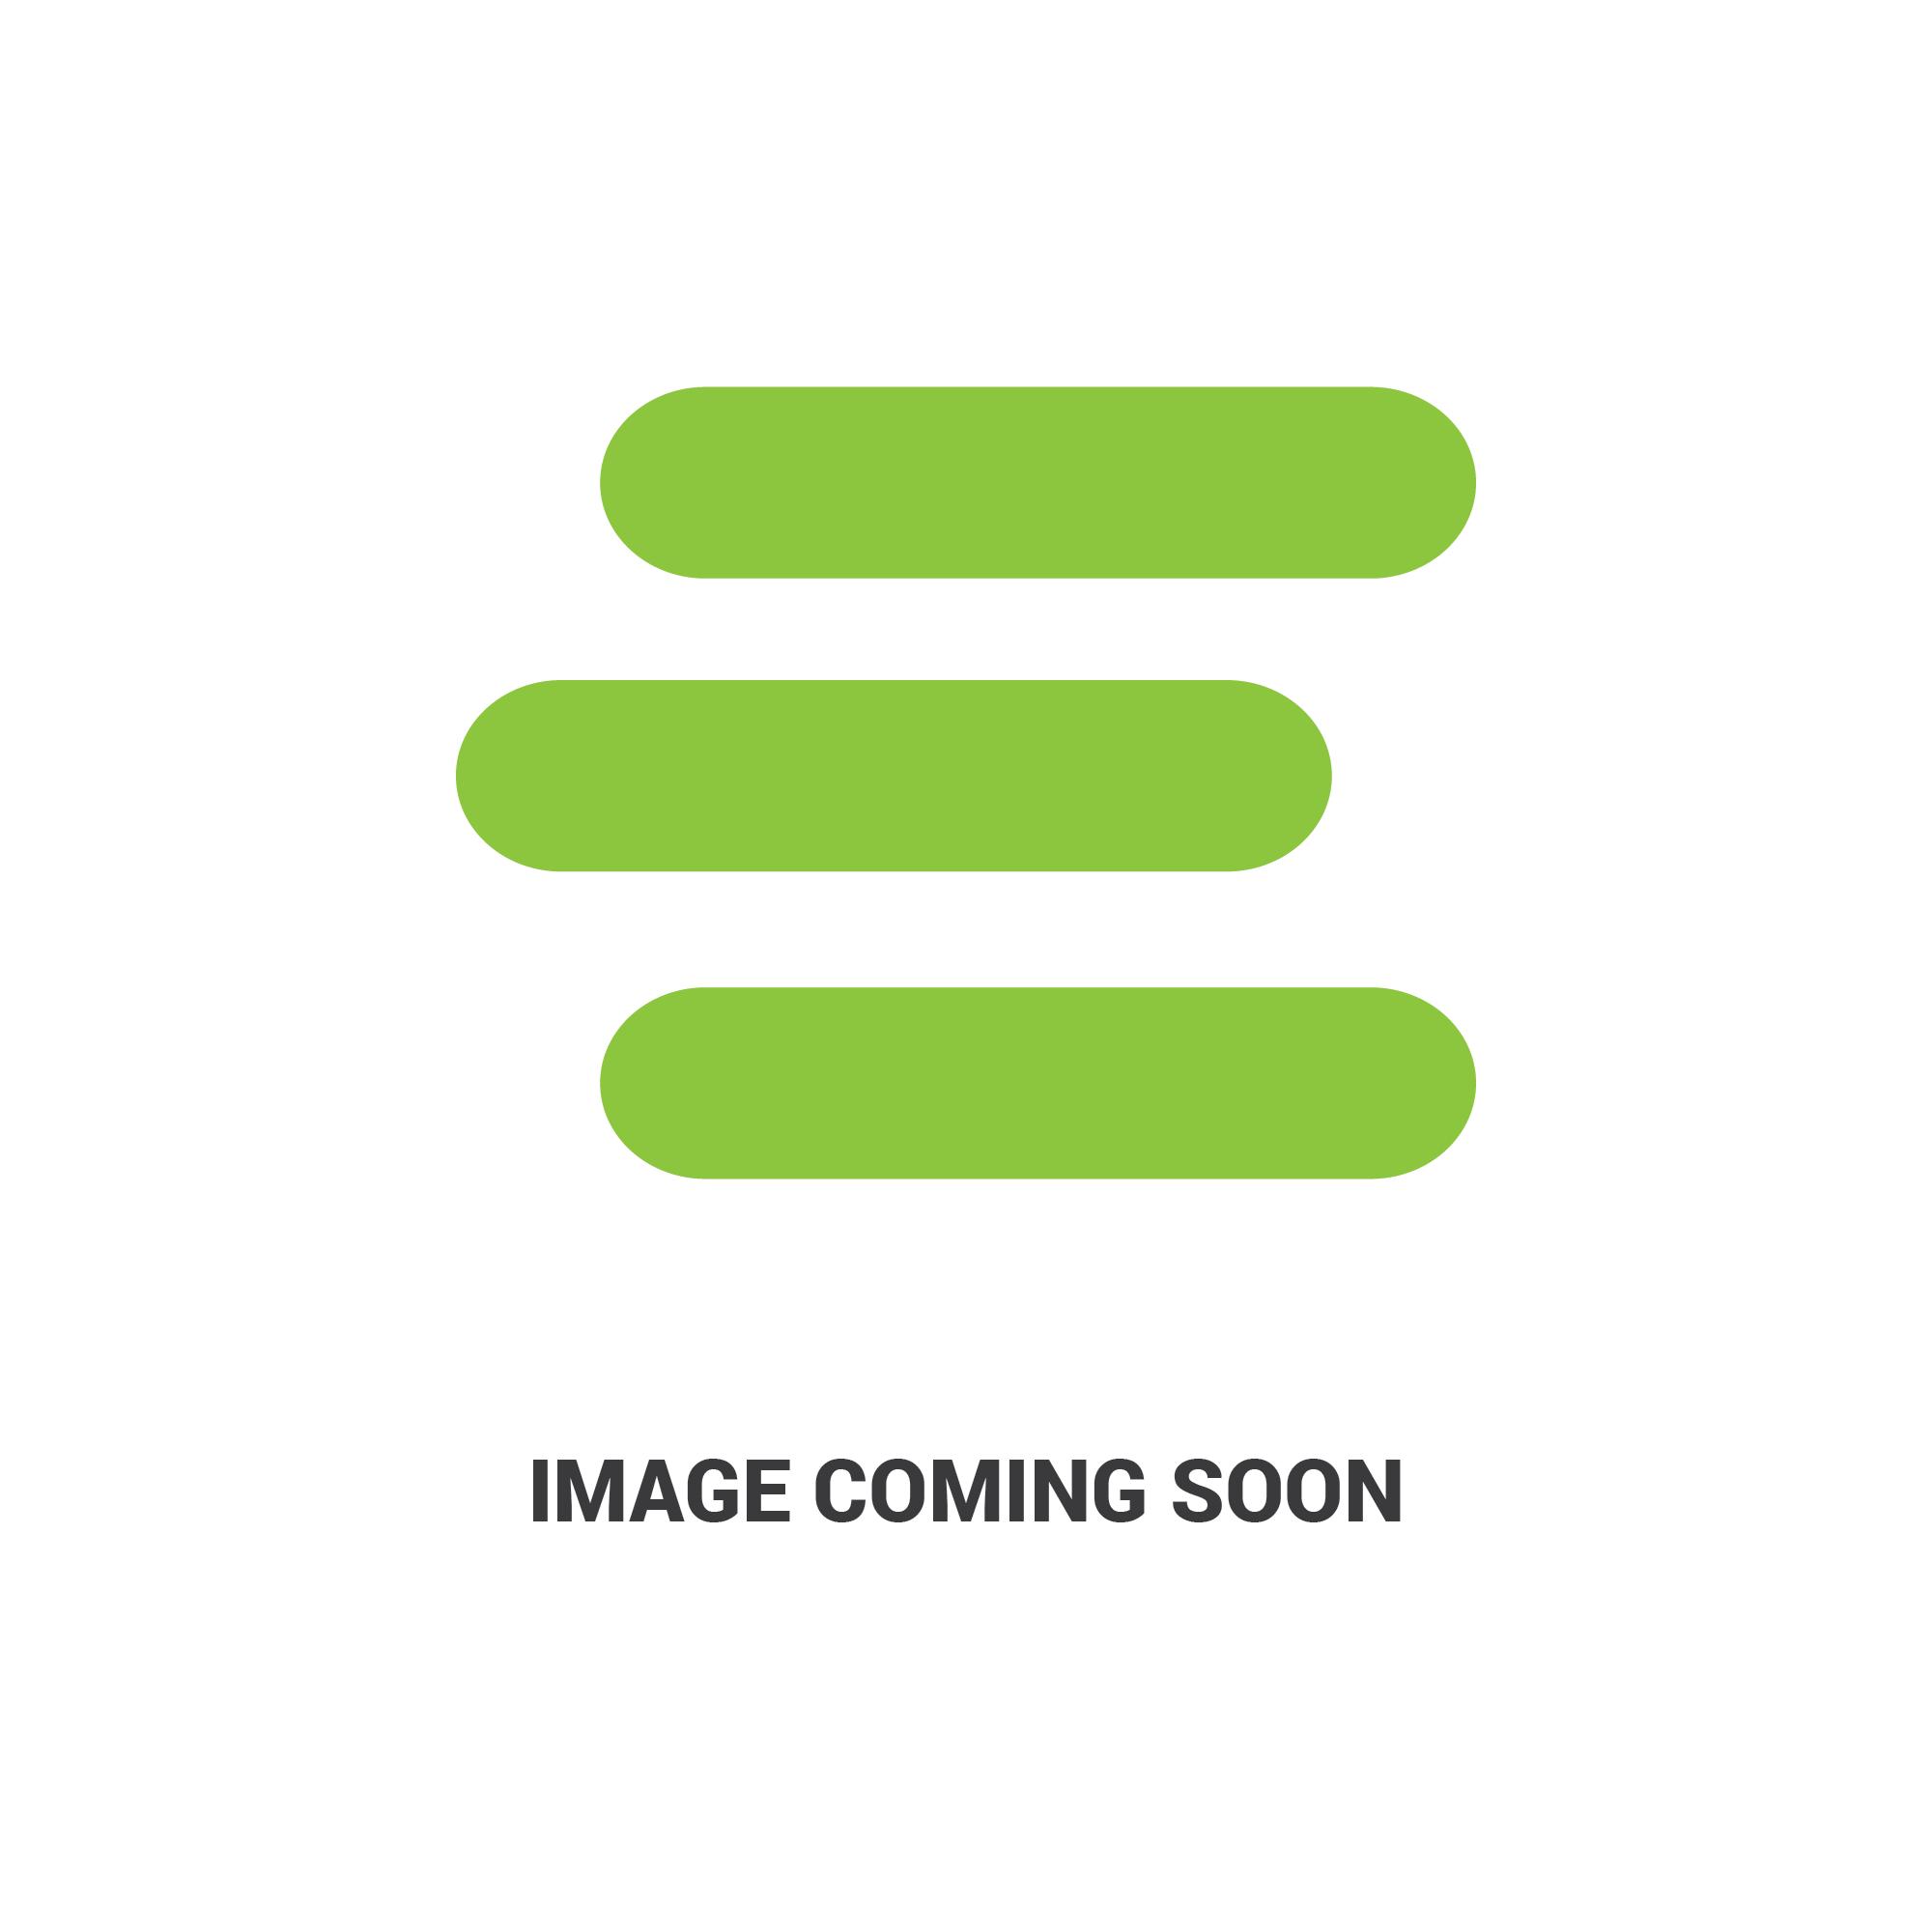 E-071052C653_1.jpg